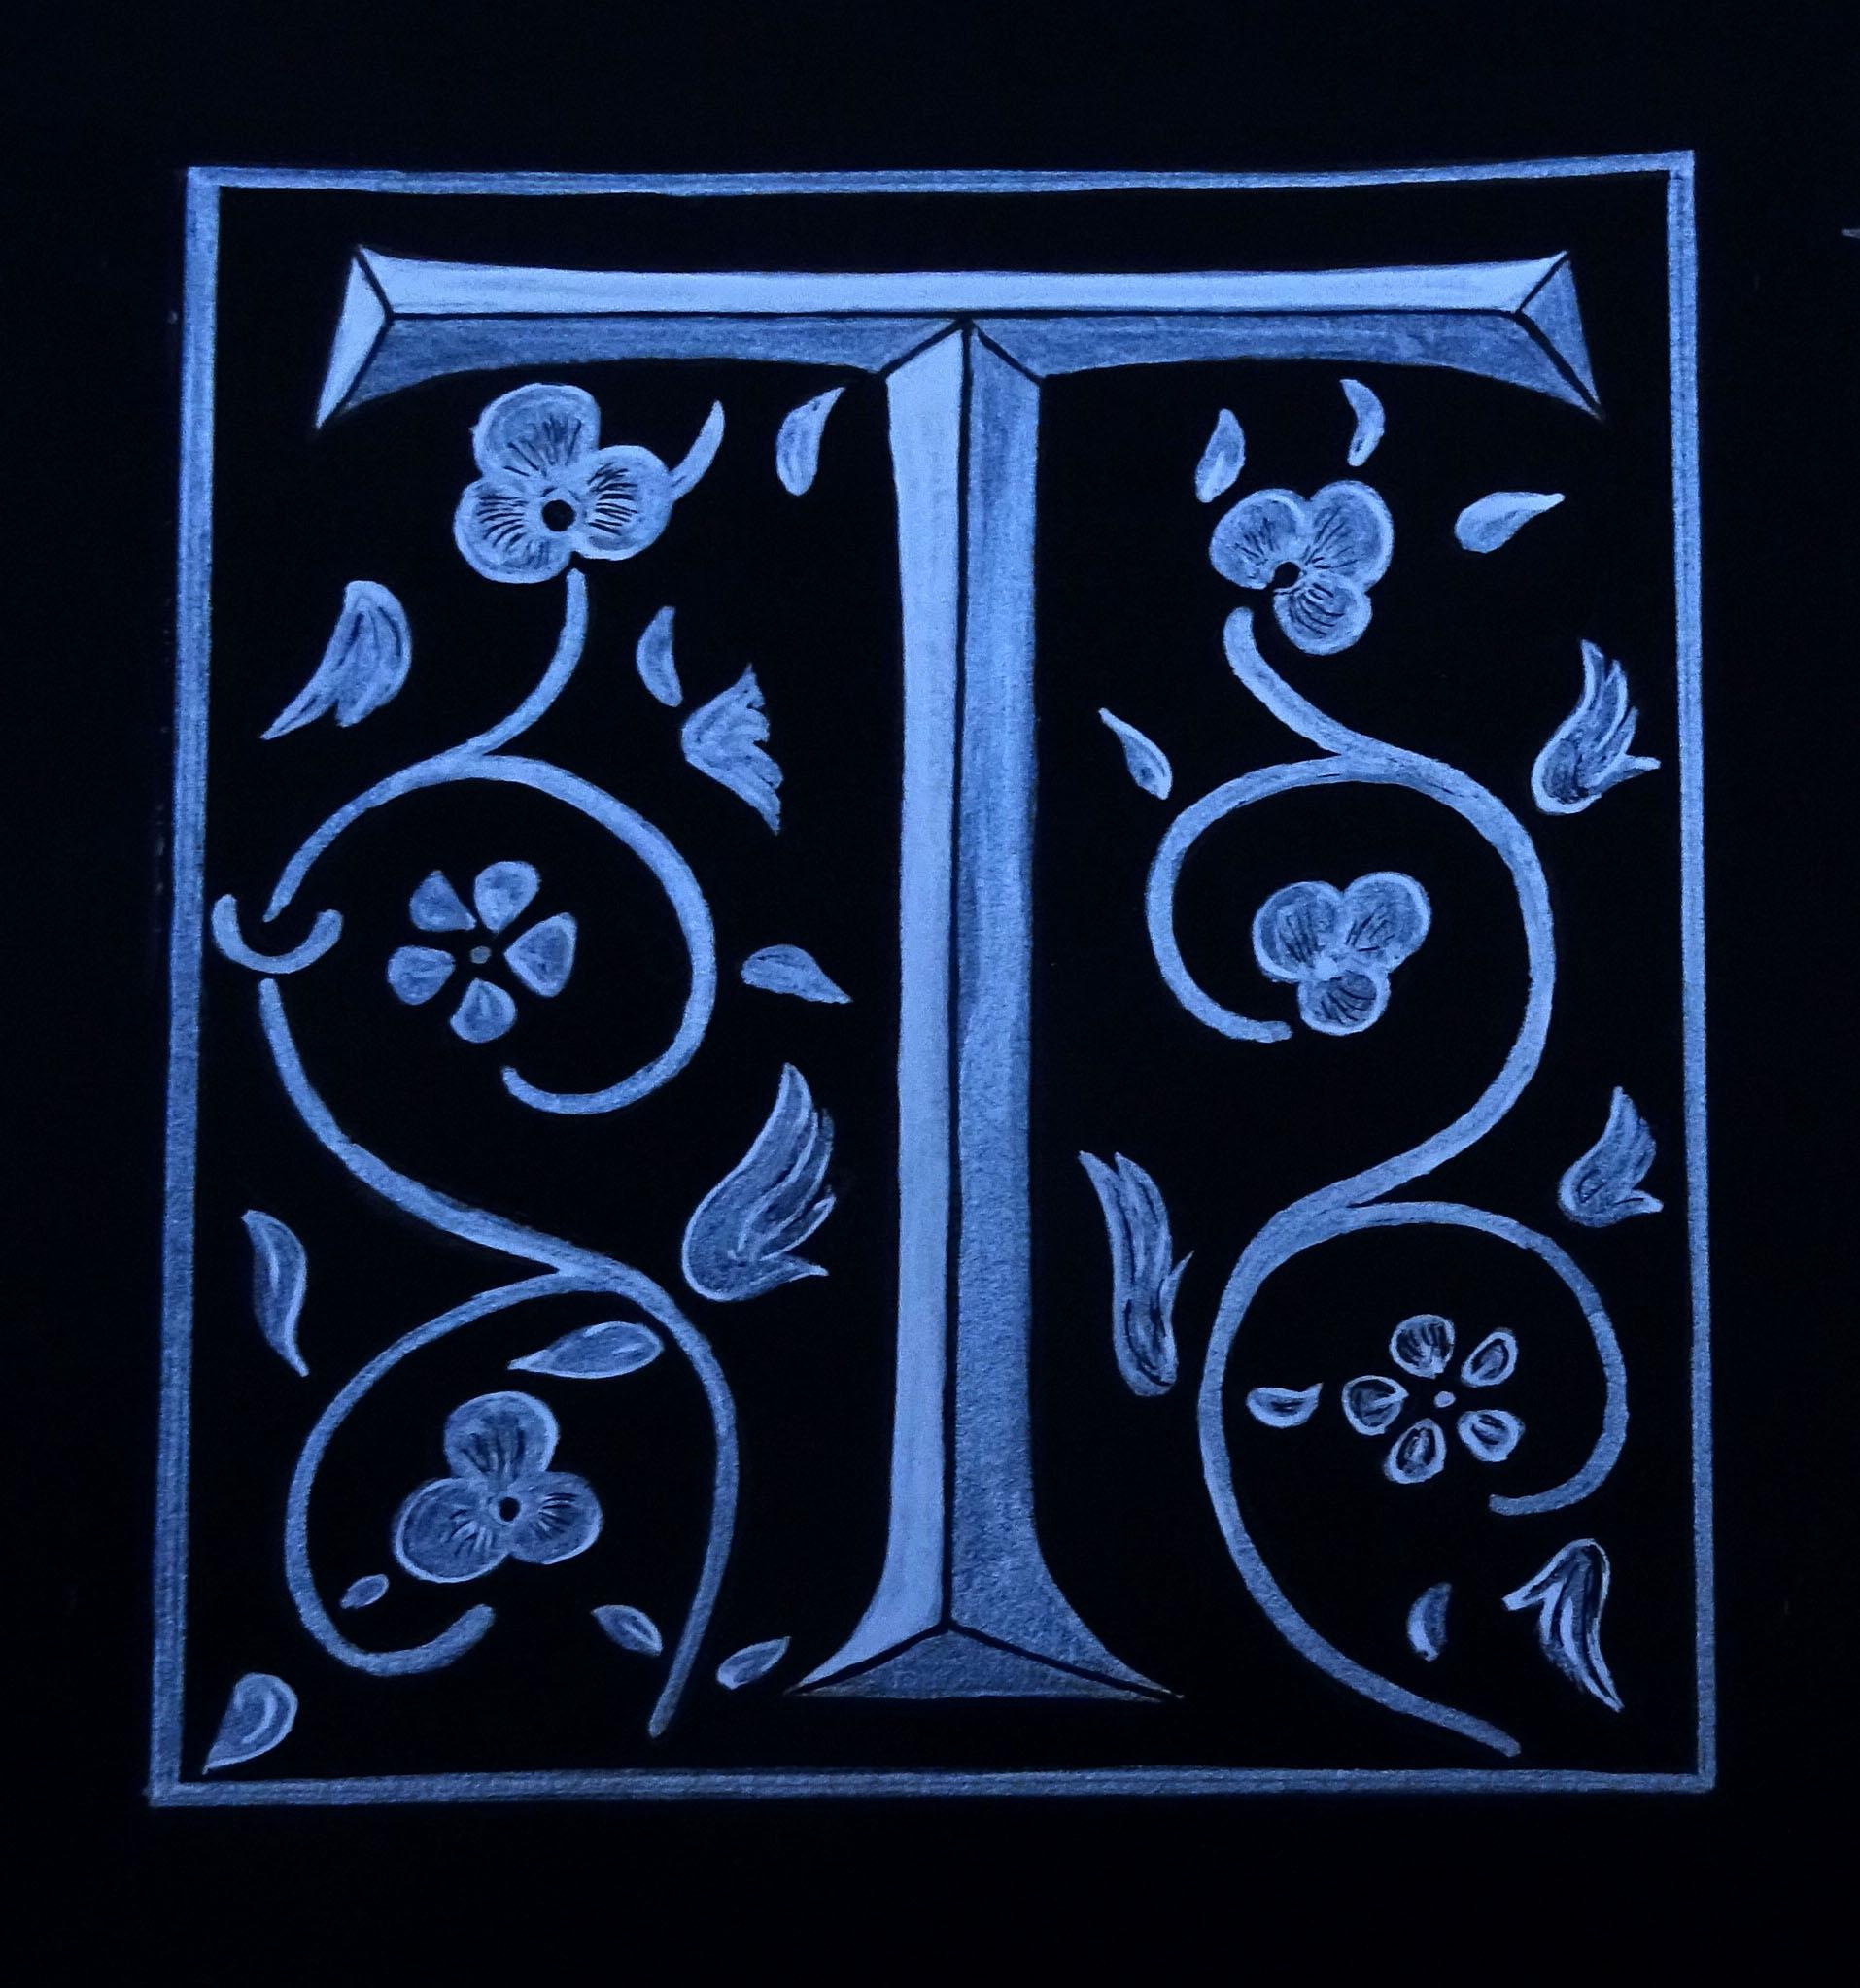 LETTRINE 16ème siècle